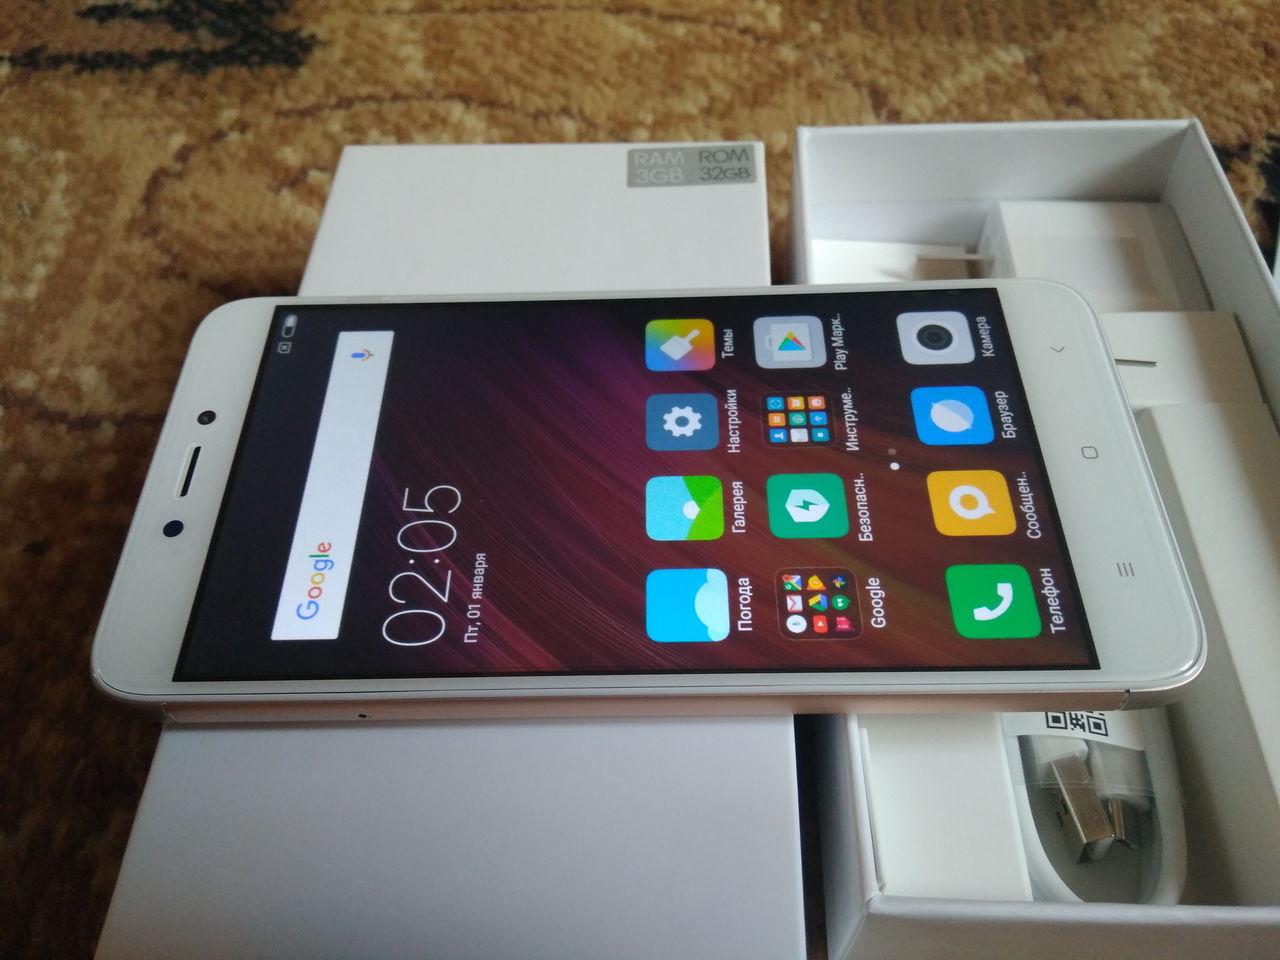 Xiaomi redmi 4x pro ram 3gb rom 32gb 8 for Plante xiaomi